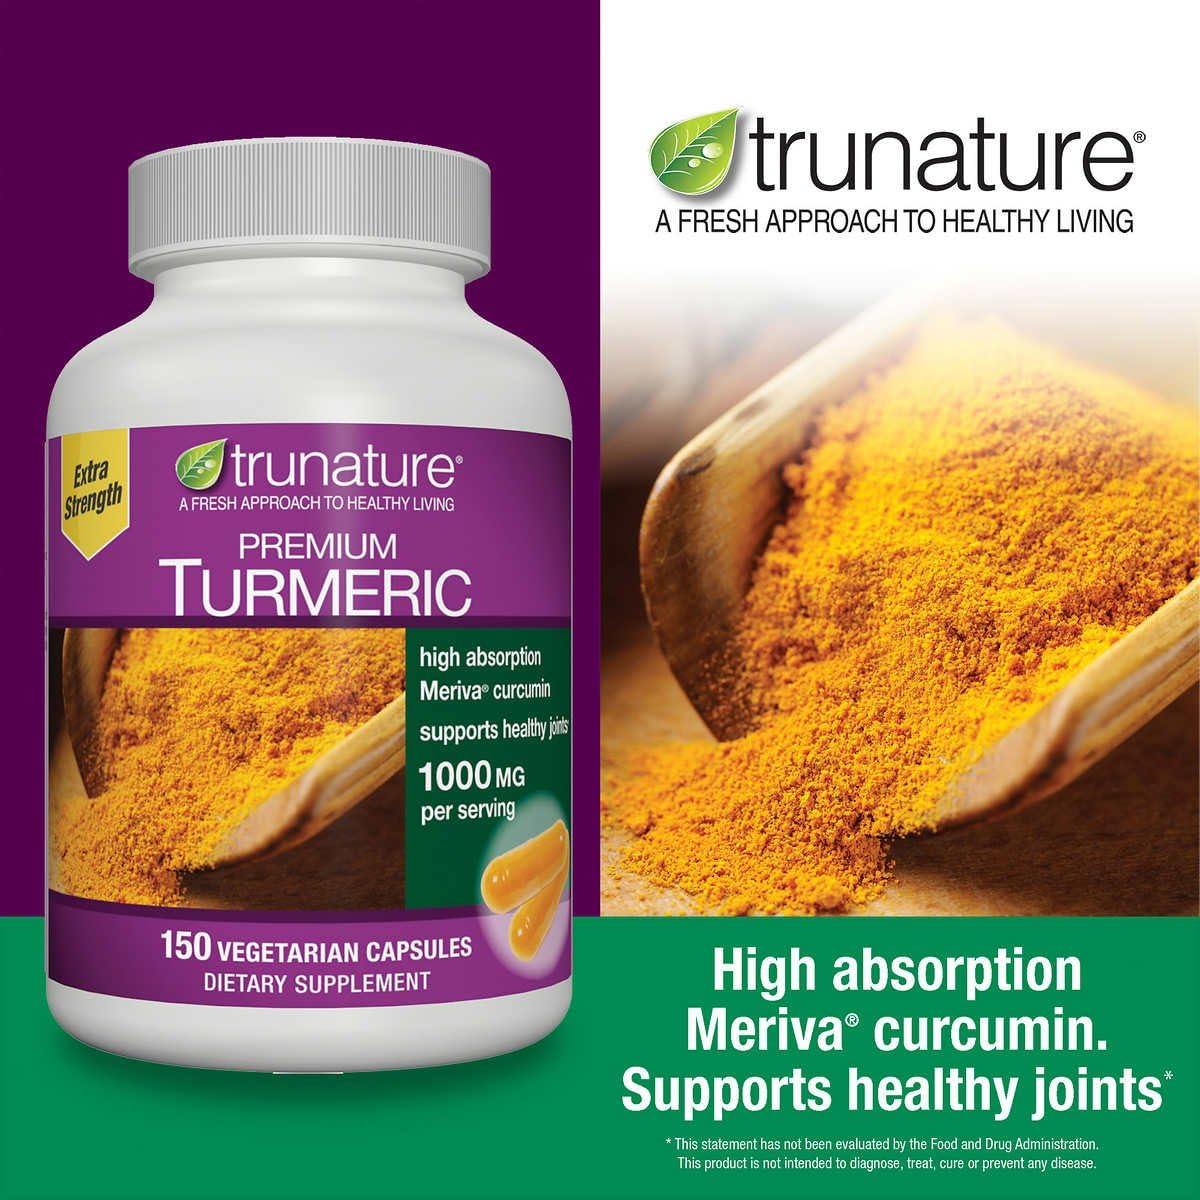 trunature Premium Turmeric 1000 mg, 150 Vegetarian Capsules 150 Capsules